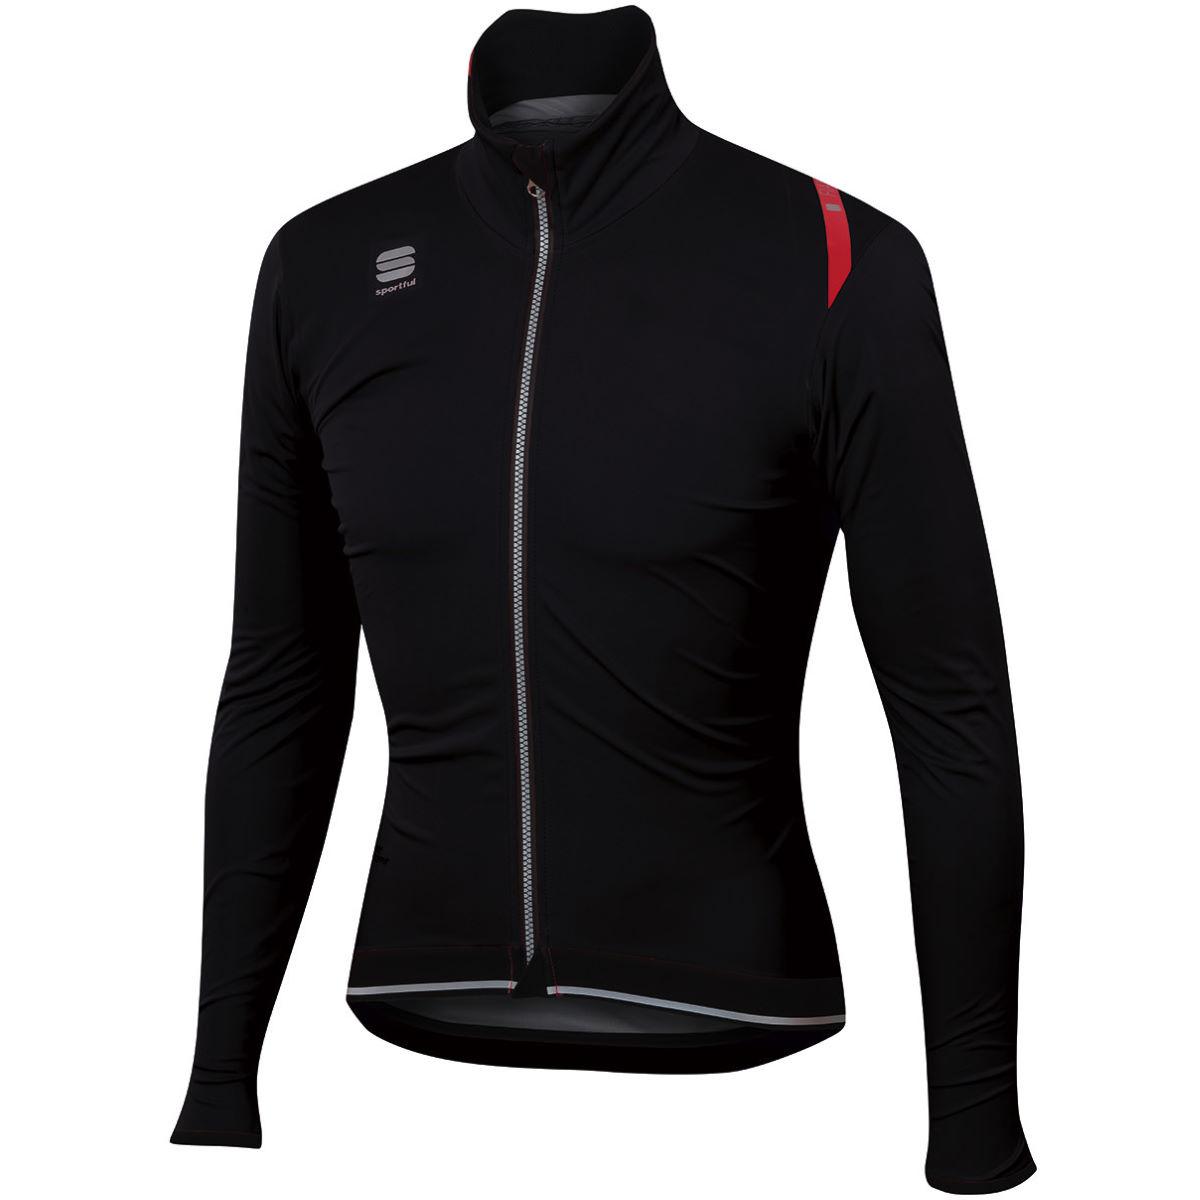 Sportful Fiandre Ultimate jacket